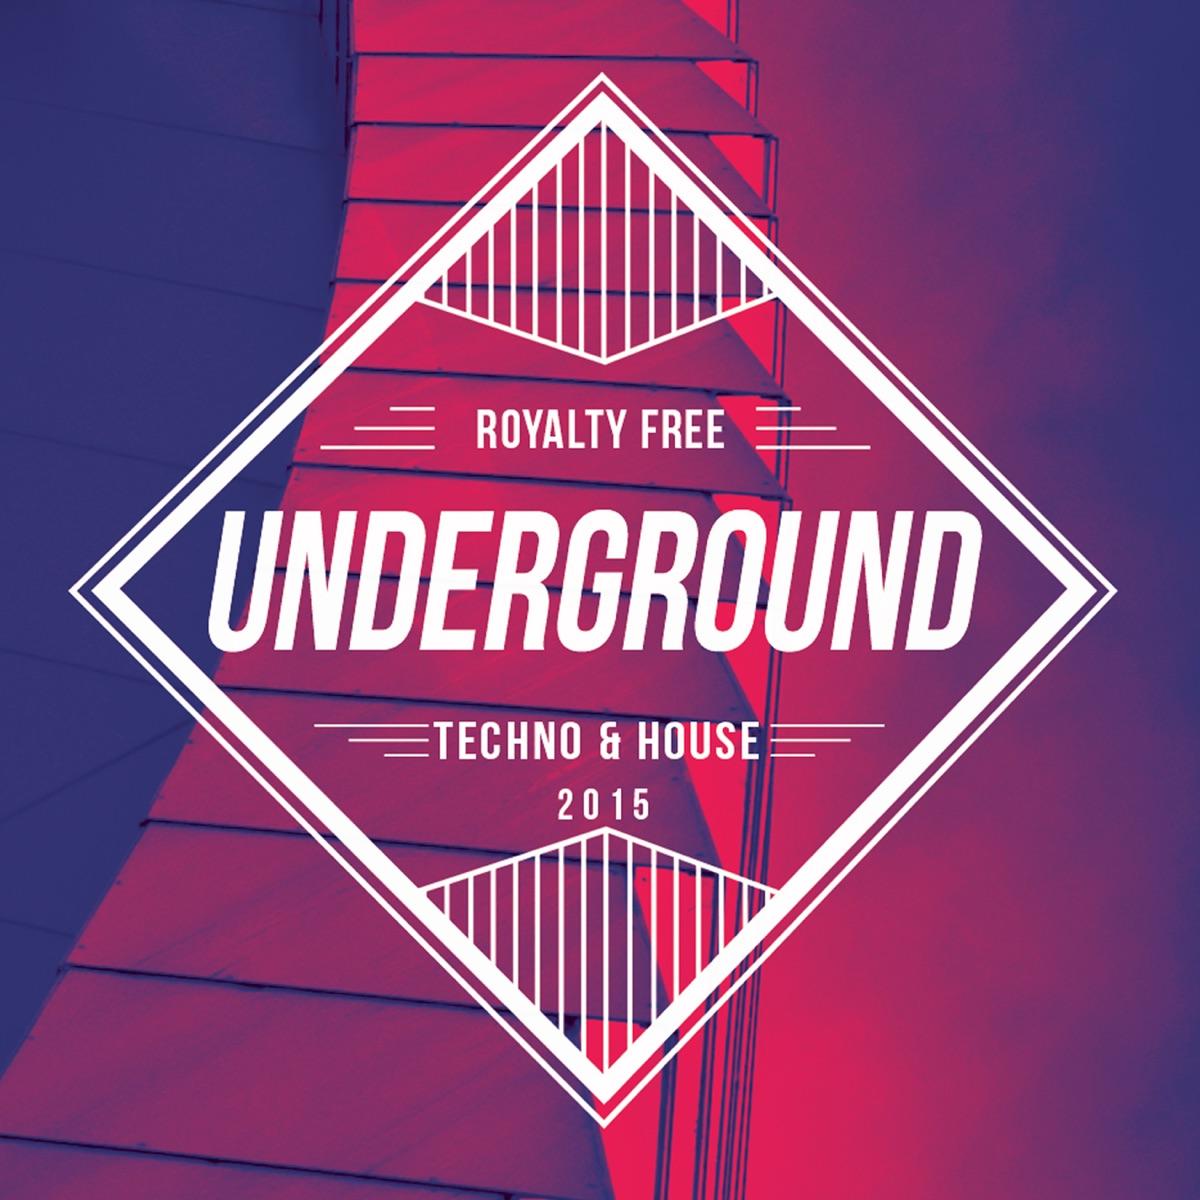 Royalty Free Underground Techno and House - EDM Songs Album